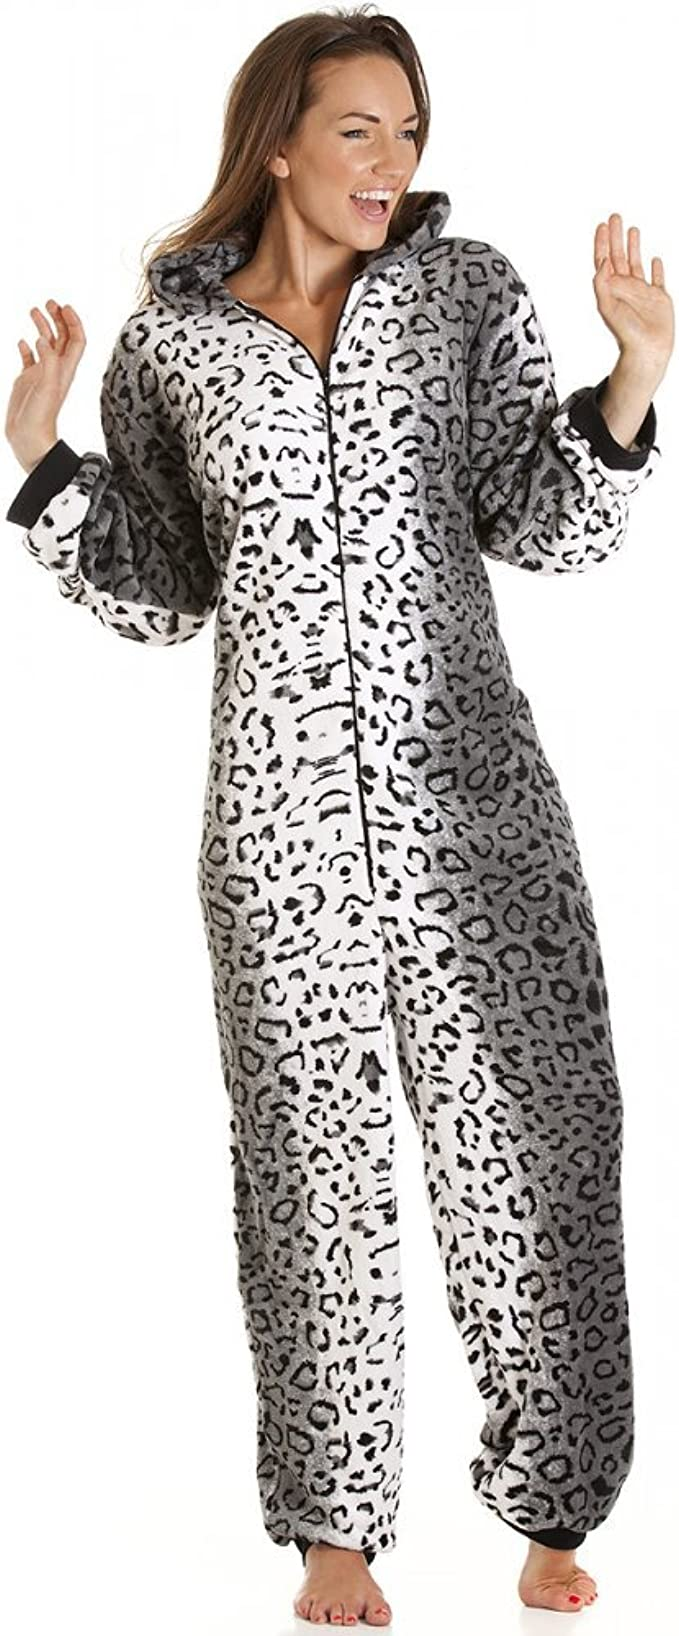 Camille Womens Ladies Snow Leopard Cat Todo en uno Pijama de Forro Polar Onesie